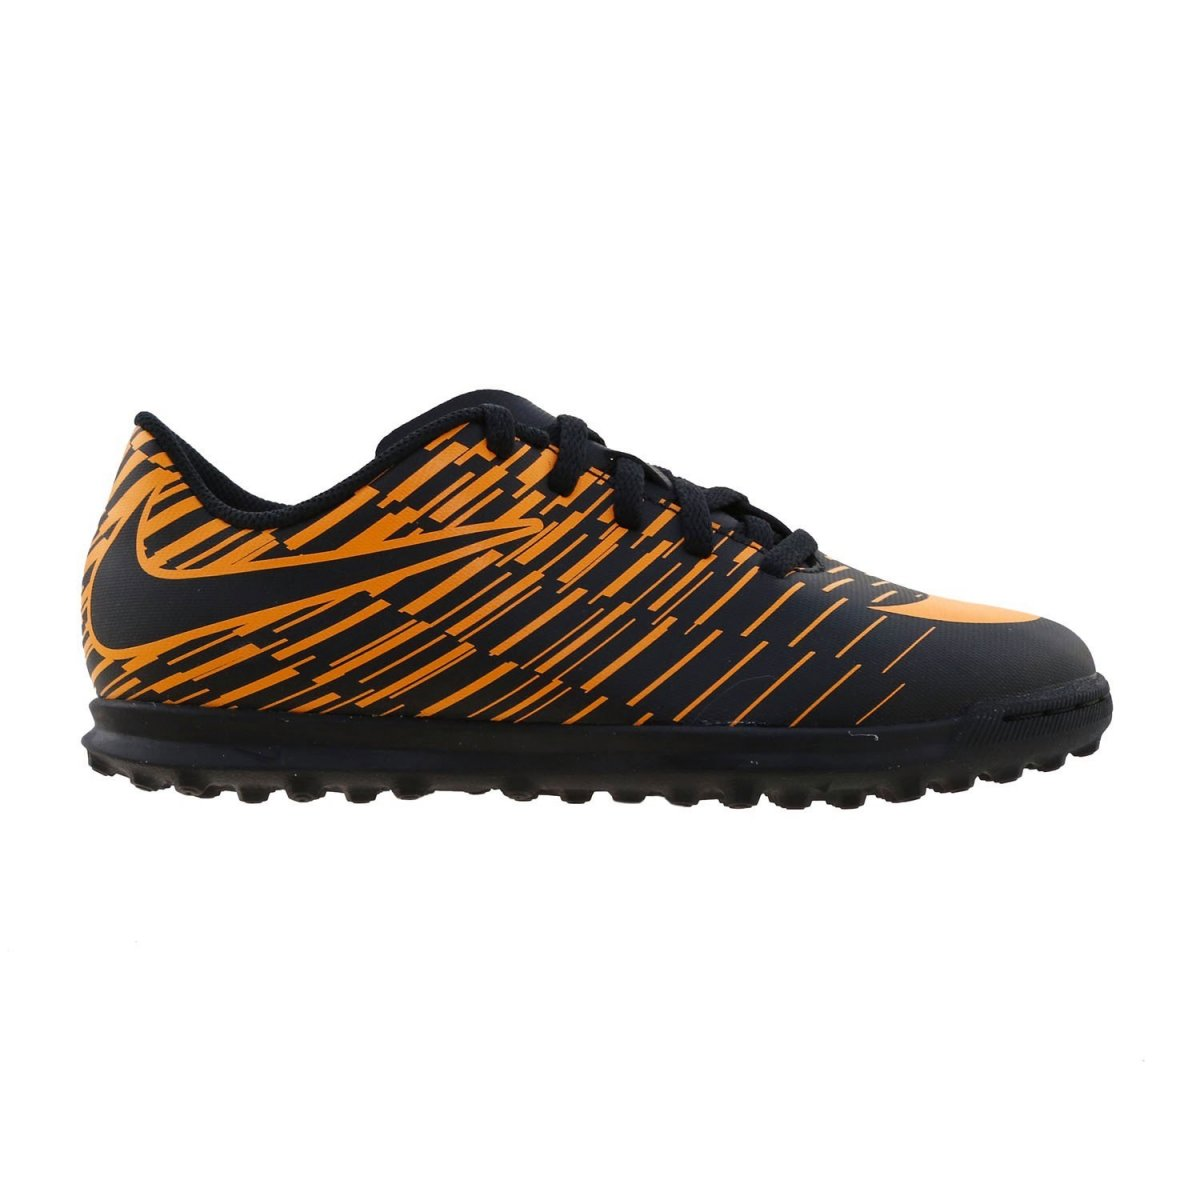 d107593b32 Amplie a imagem. Chuteira Infantil Society Nike Bravatax II TF  Chuteira  Infantil Society Nike ...